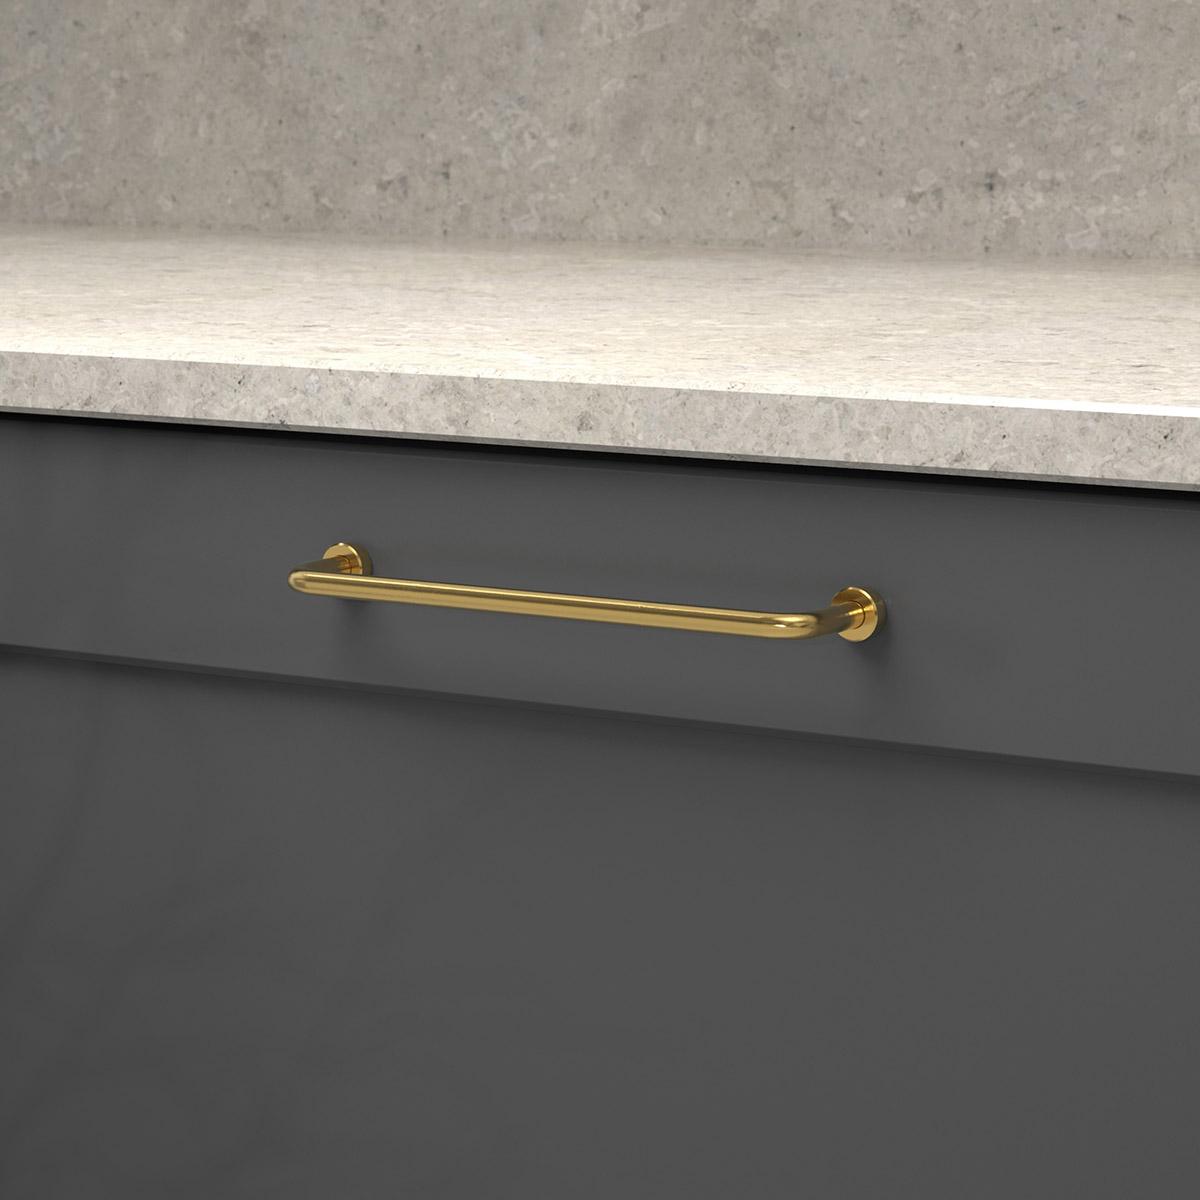 Handtag lounge polerad massing 370121 11 cc 160 mm ncs s 7500 n kalksten